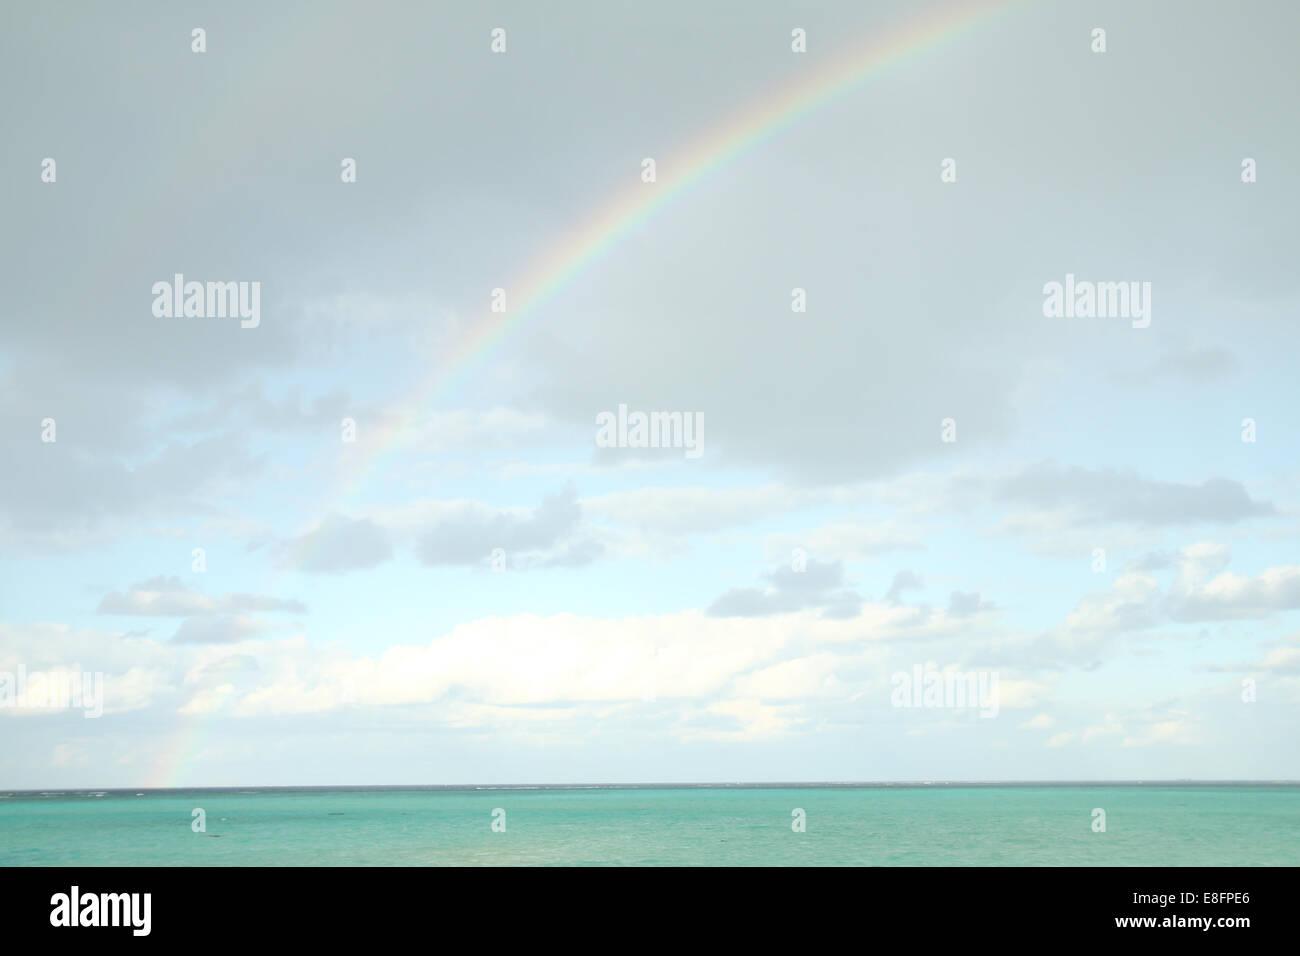 Rainbow over ocean, Japan - Stock Image